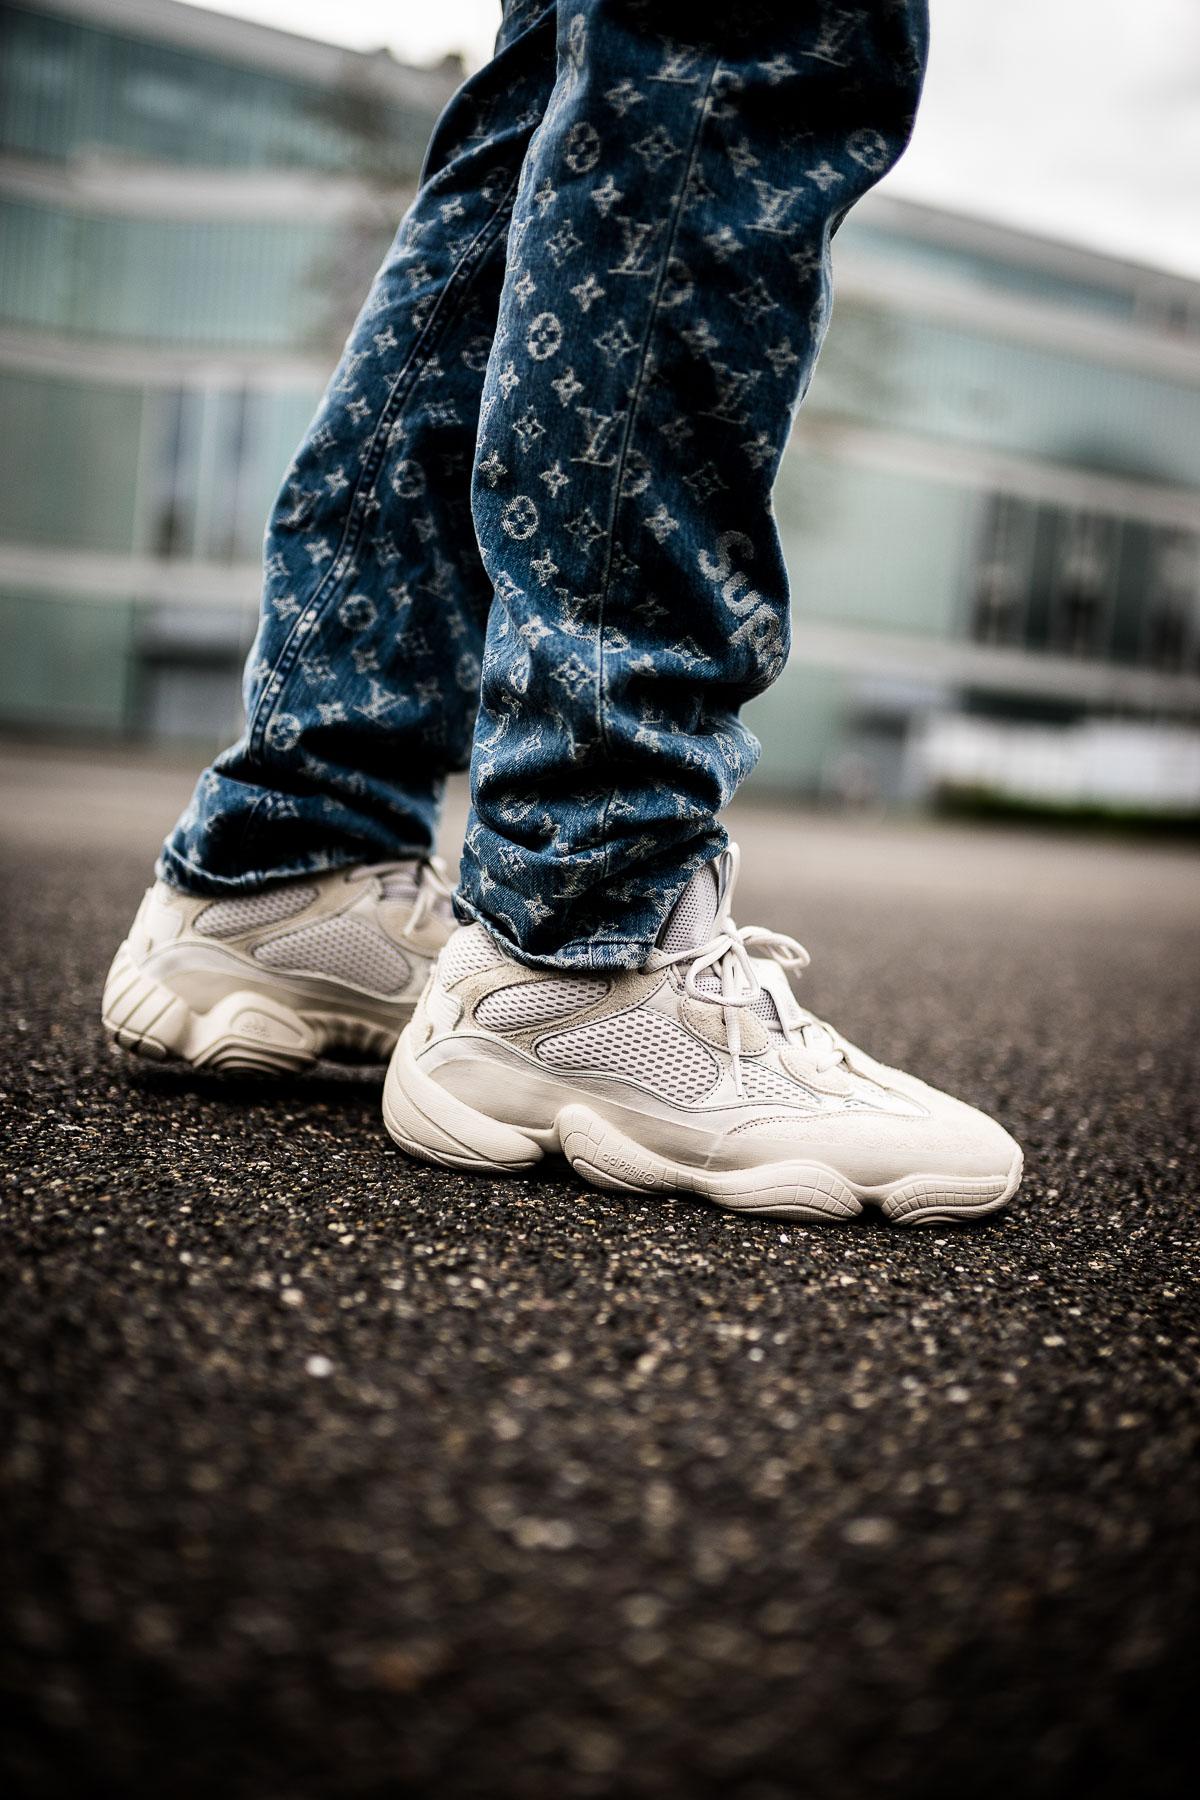 adidas yeezy 500 blush on feet dead stock sneakerblog